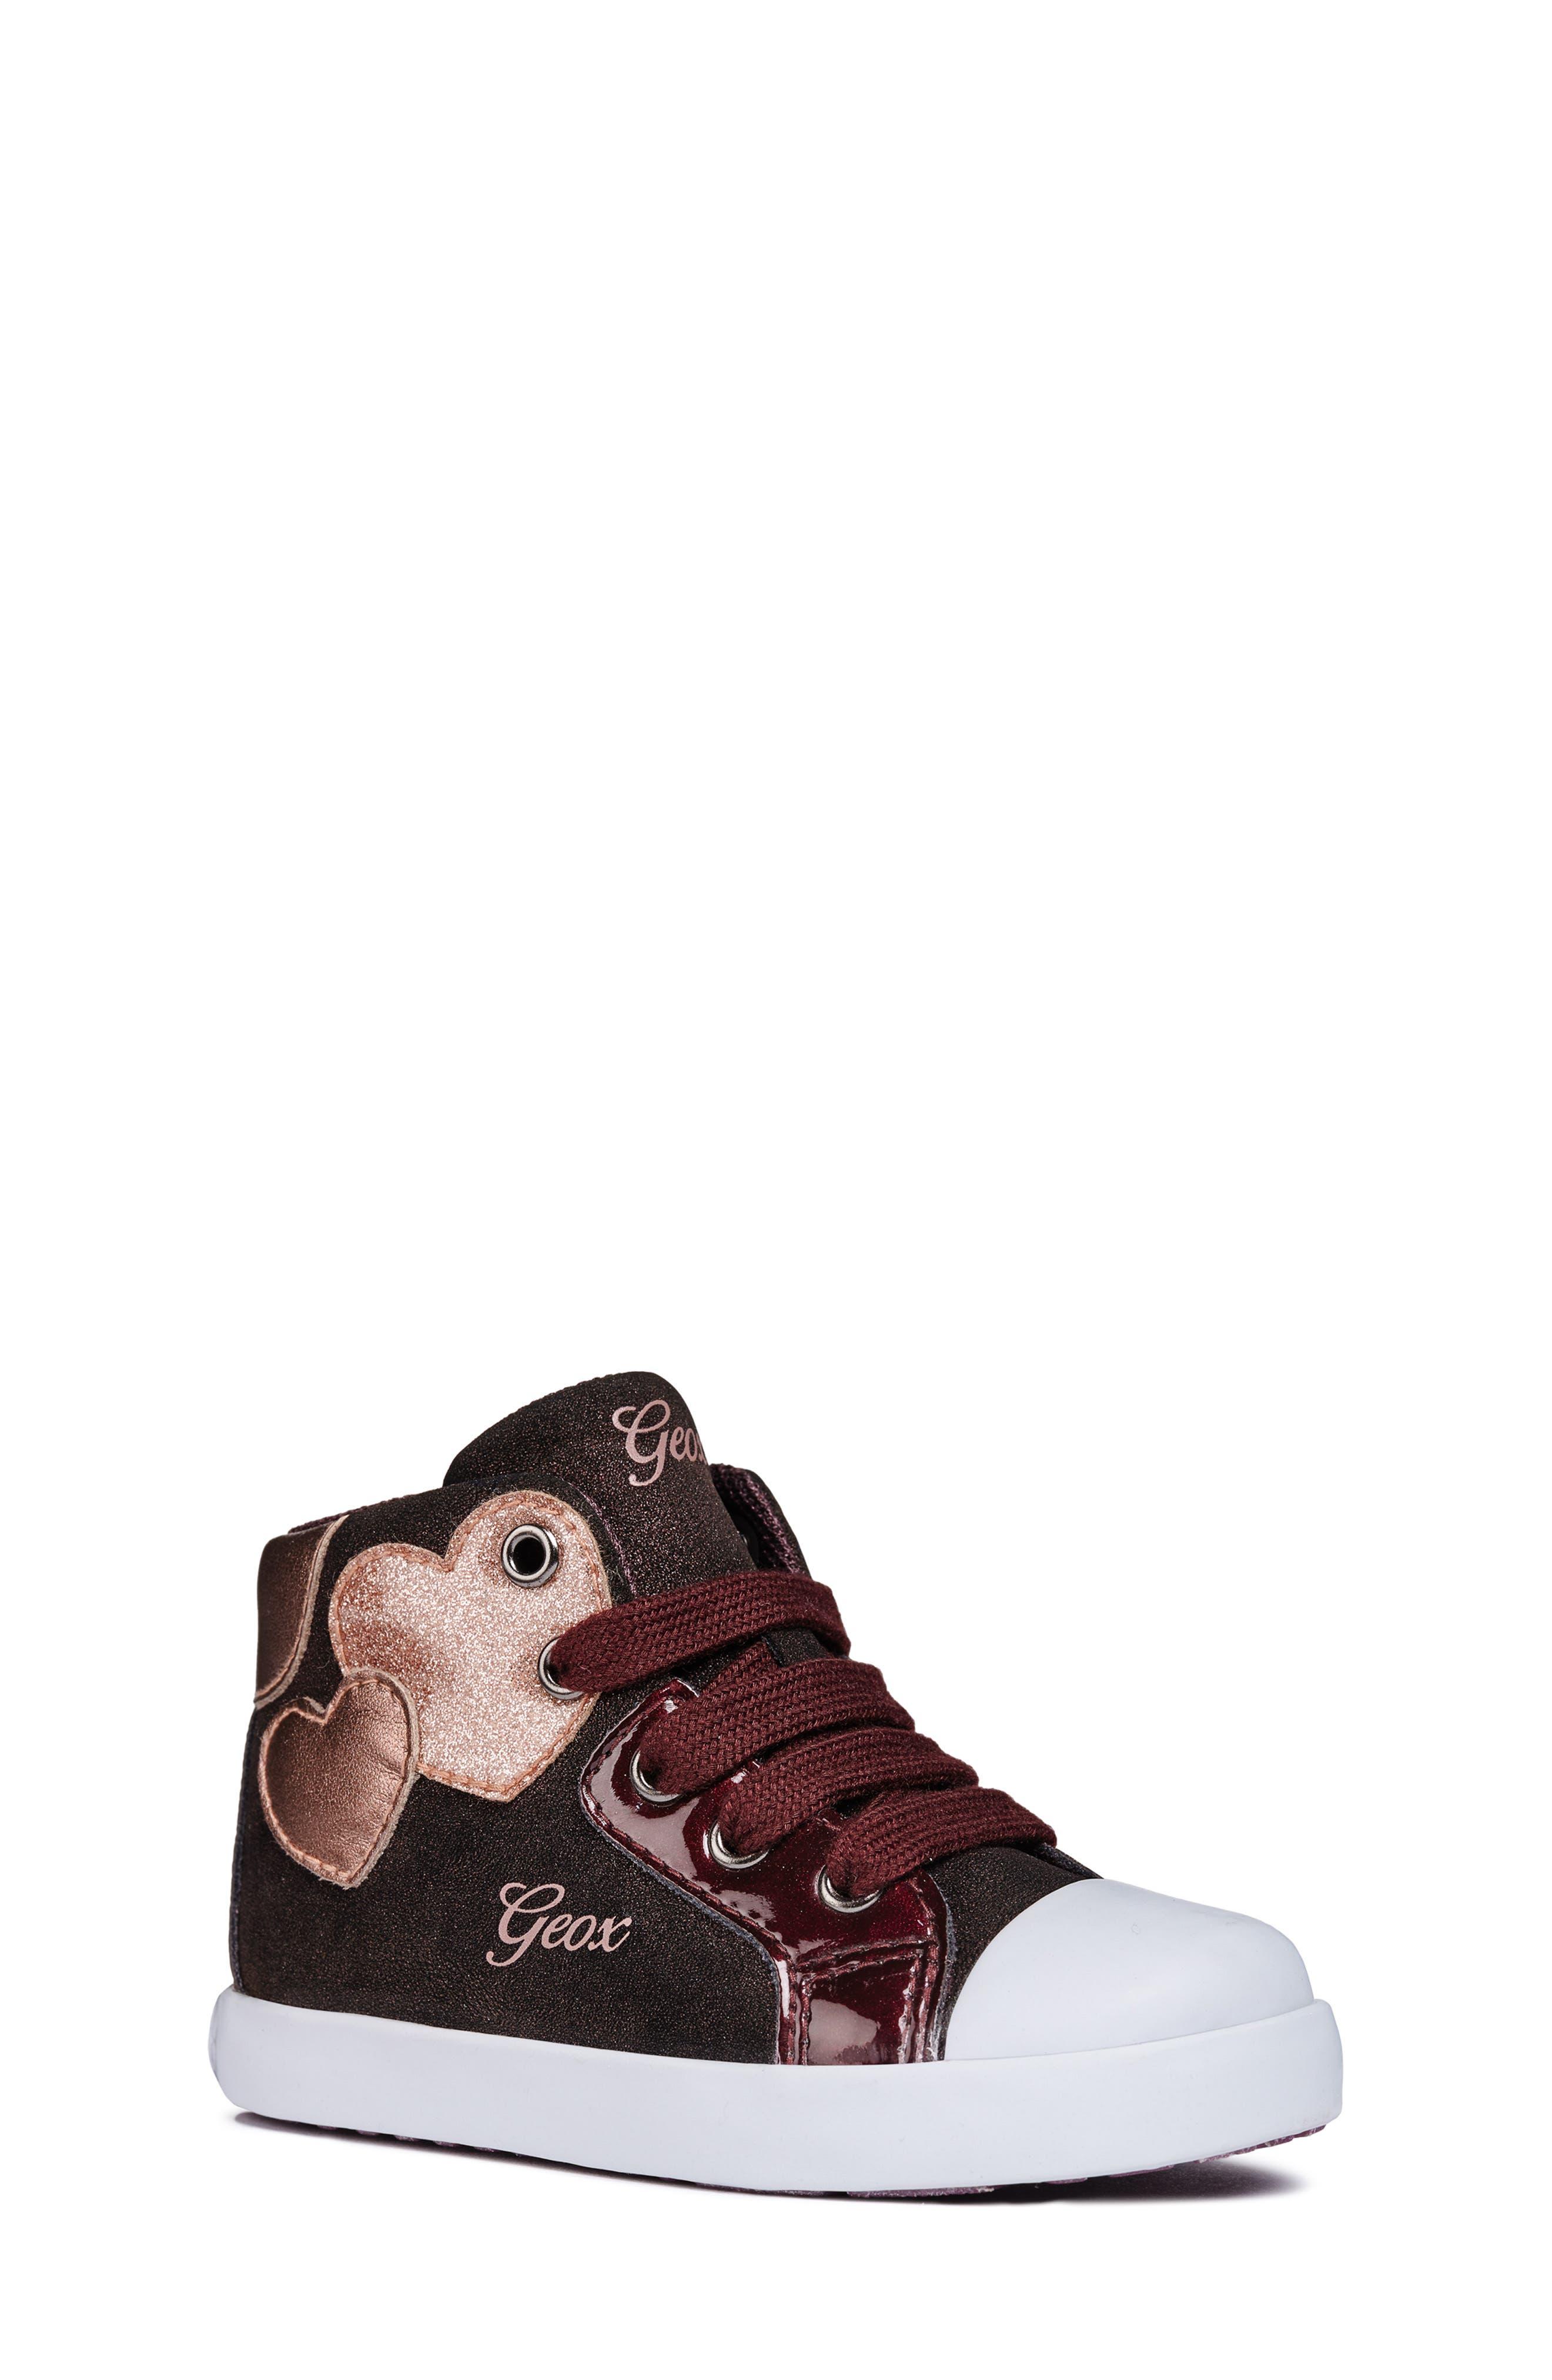 Kilwi Sparkle High Top Sneaker,                         Main,                         color, DARK BURGUNDY